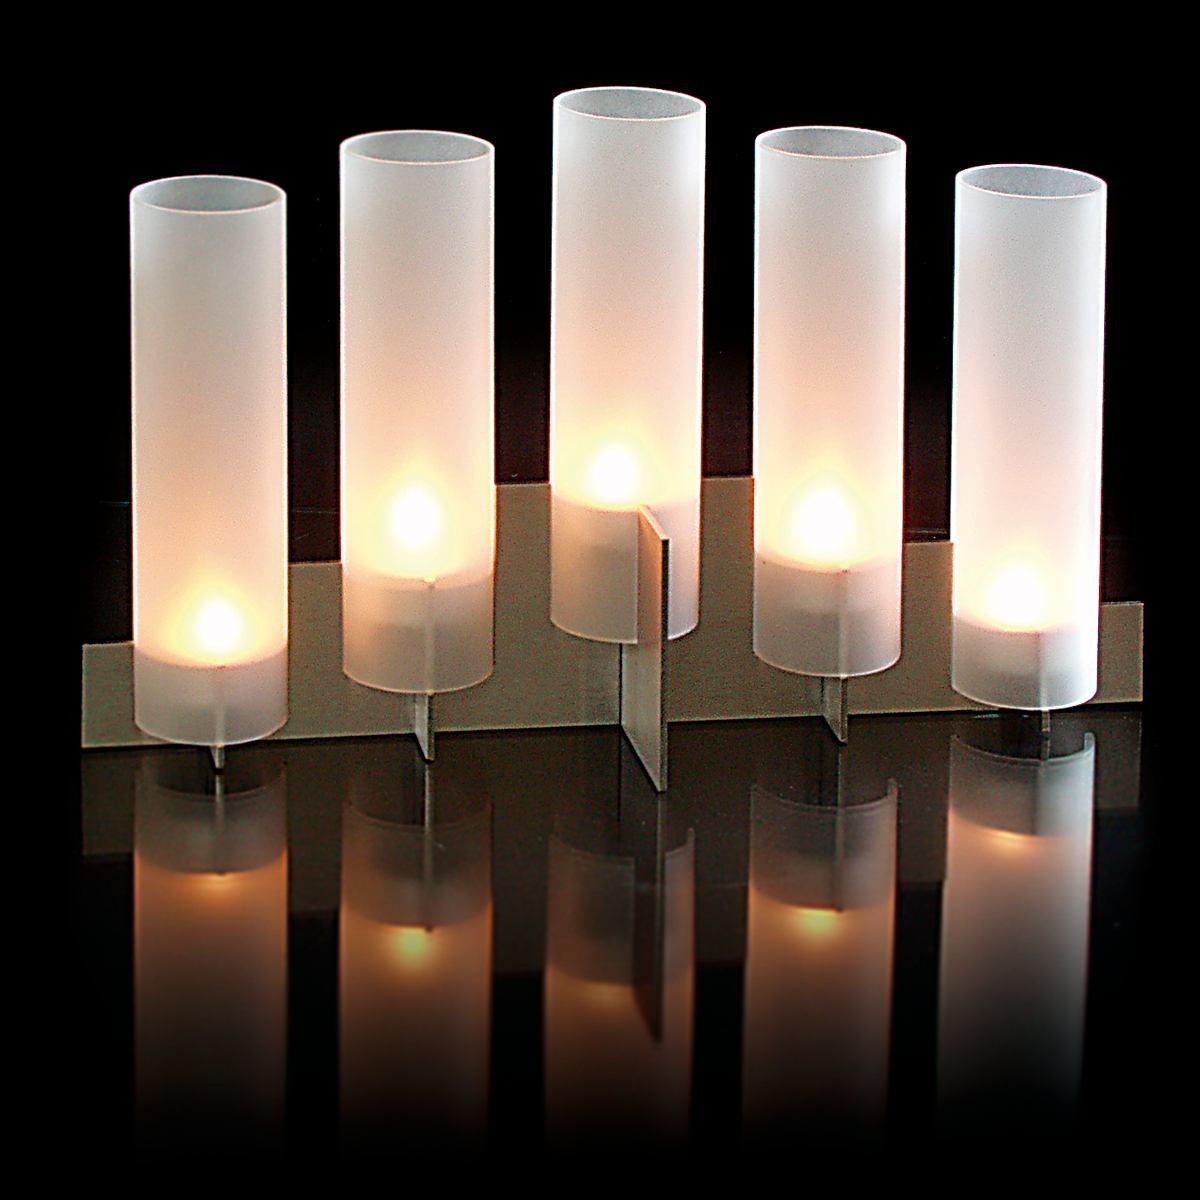 A+B ZJONE Kerzenformen Zum Gie/ßen Set Gro/ß Kunststoff Tischlampenform Kerzengie/ßform Durable Sechszackiger Sternenturm Kerzen Formen F/ür DIY Hausgemachte Kerzen